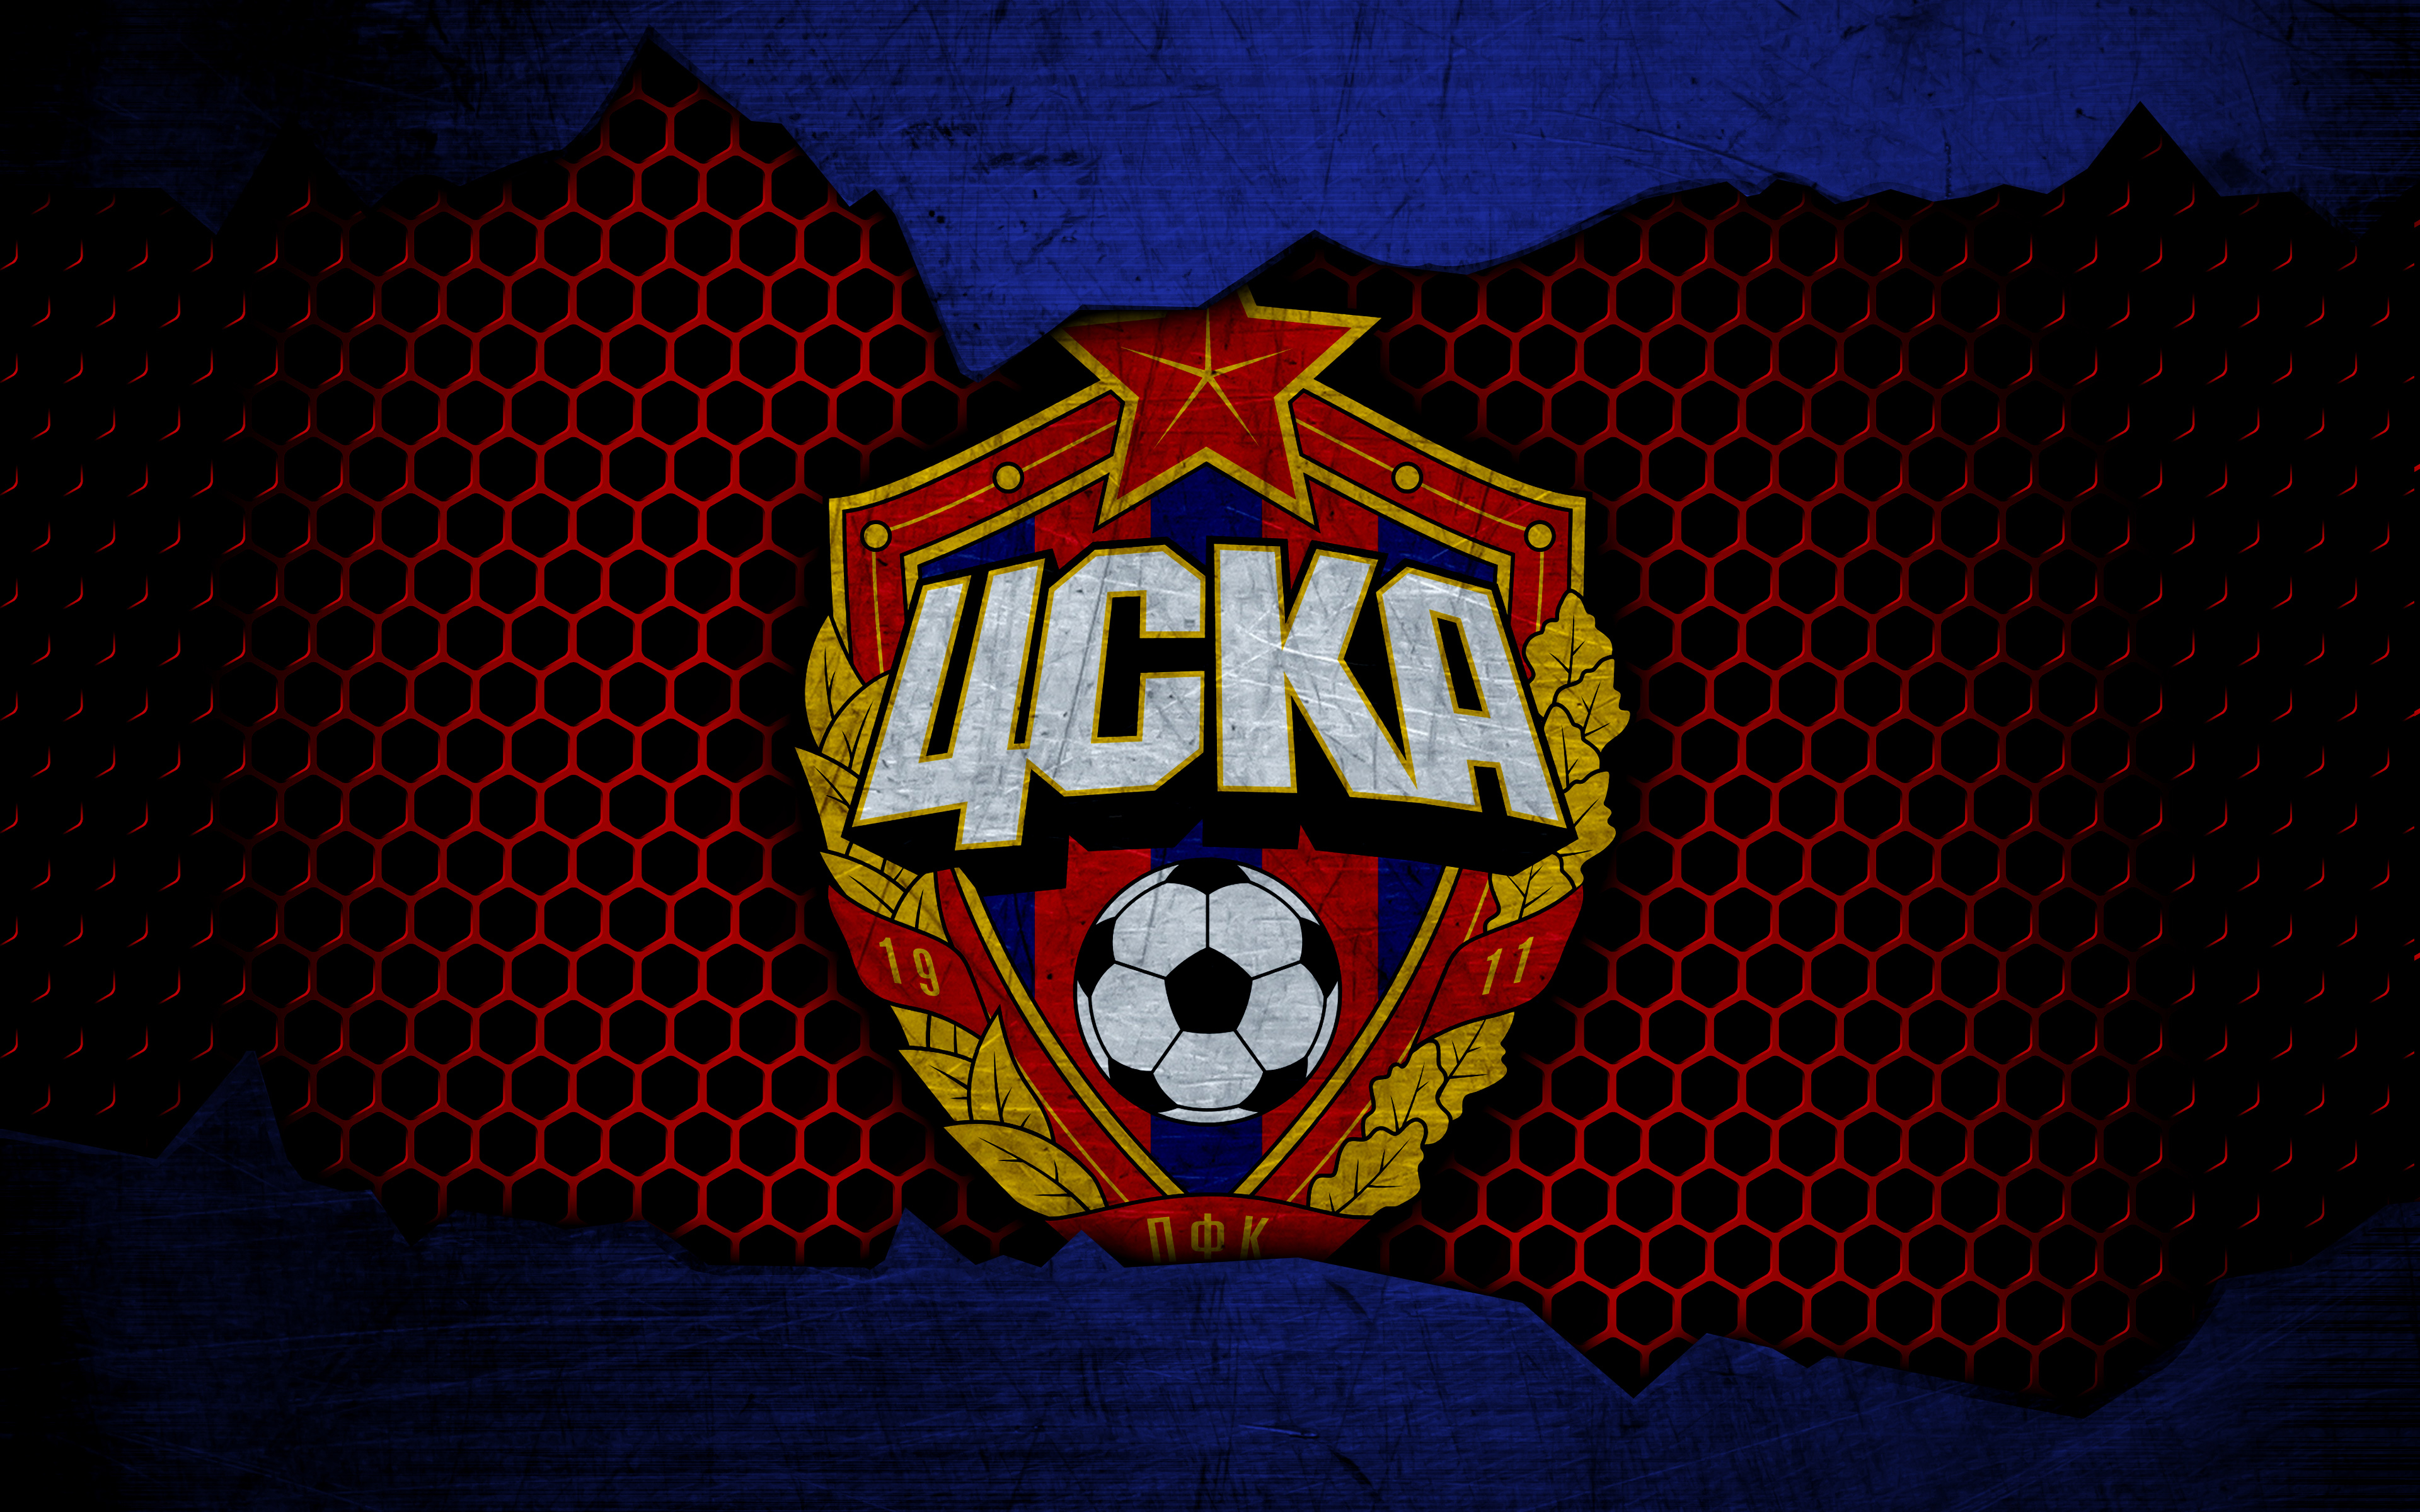 PFC CSKA Moscow 4k Ultra HD Wallpaper Background Image 3840x2400